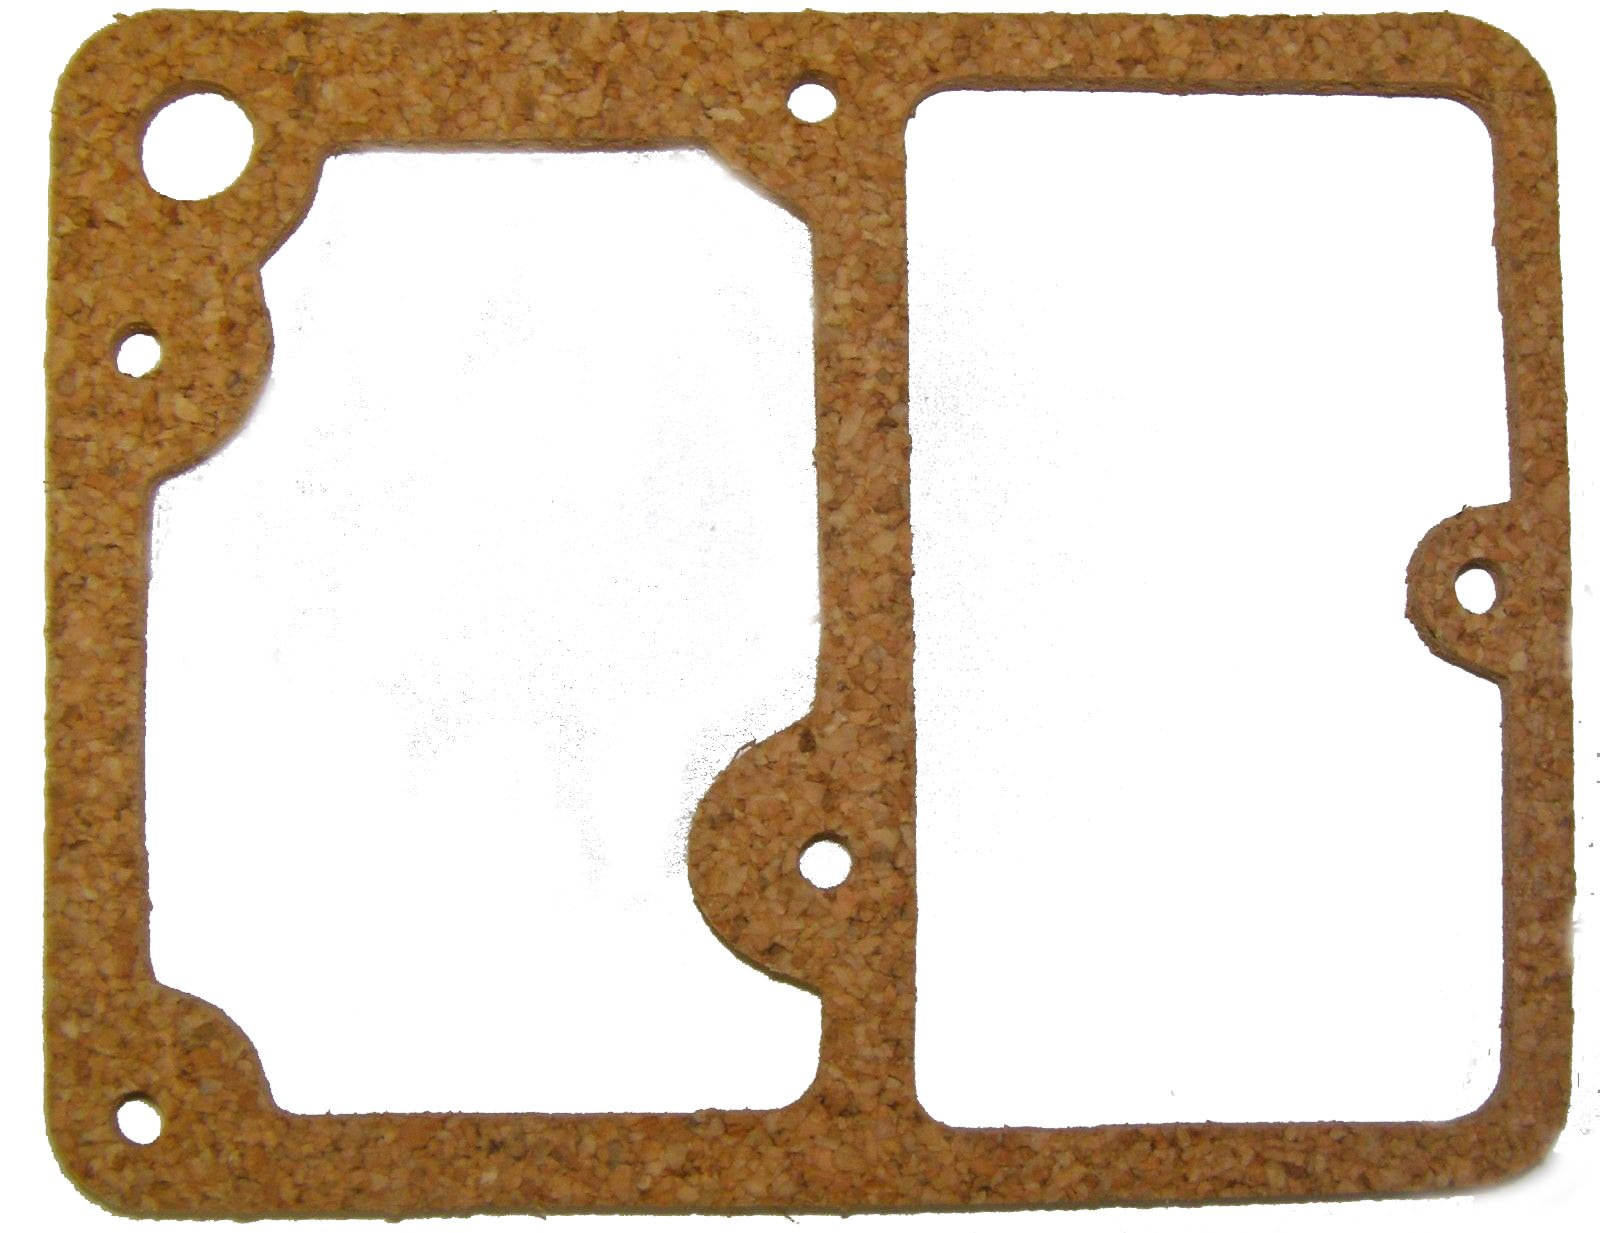 147012 Rectangular Filter Gasket for Heater Toro Century Champion Gilson Lawn Boy Porta Heat 118565 147012 222796 35381 26839 6839NR 6839 154003 147019